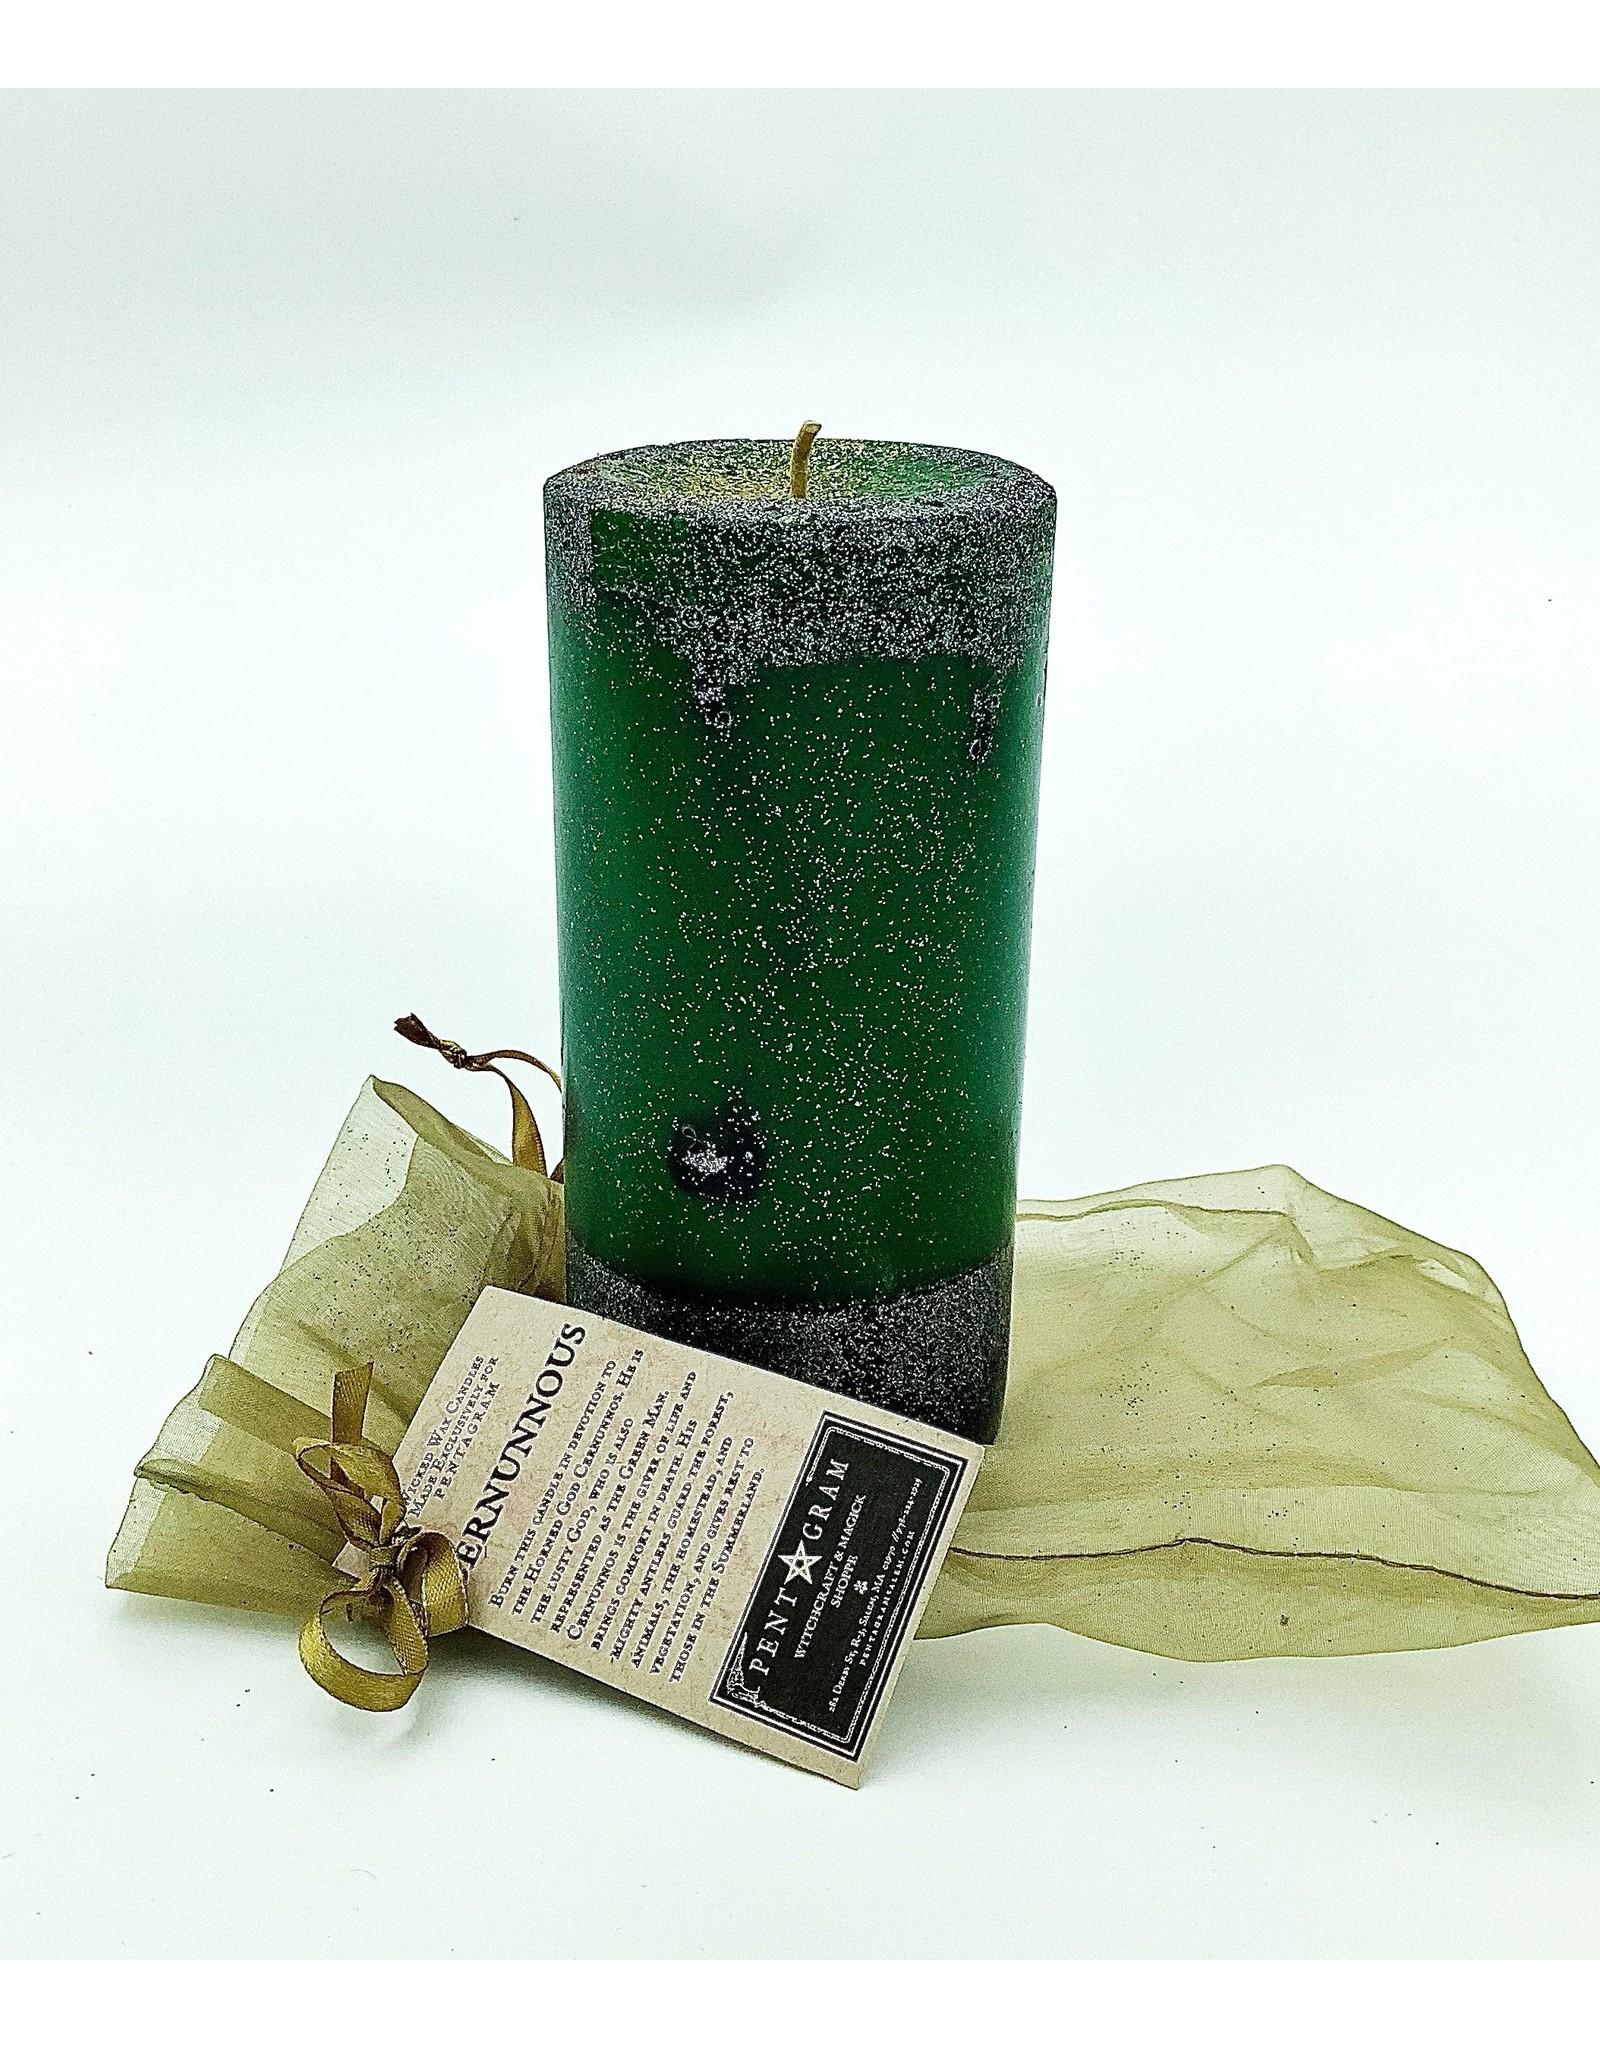 Cernunnous Handmade Candle